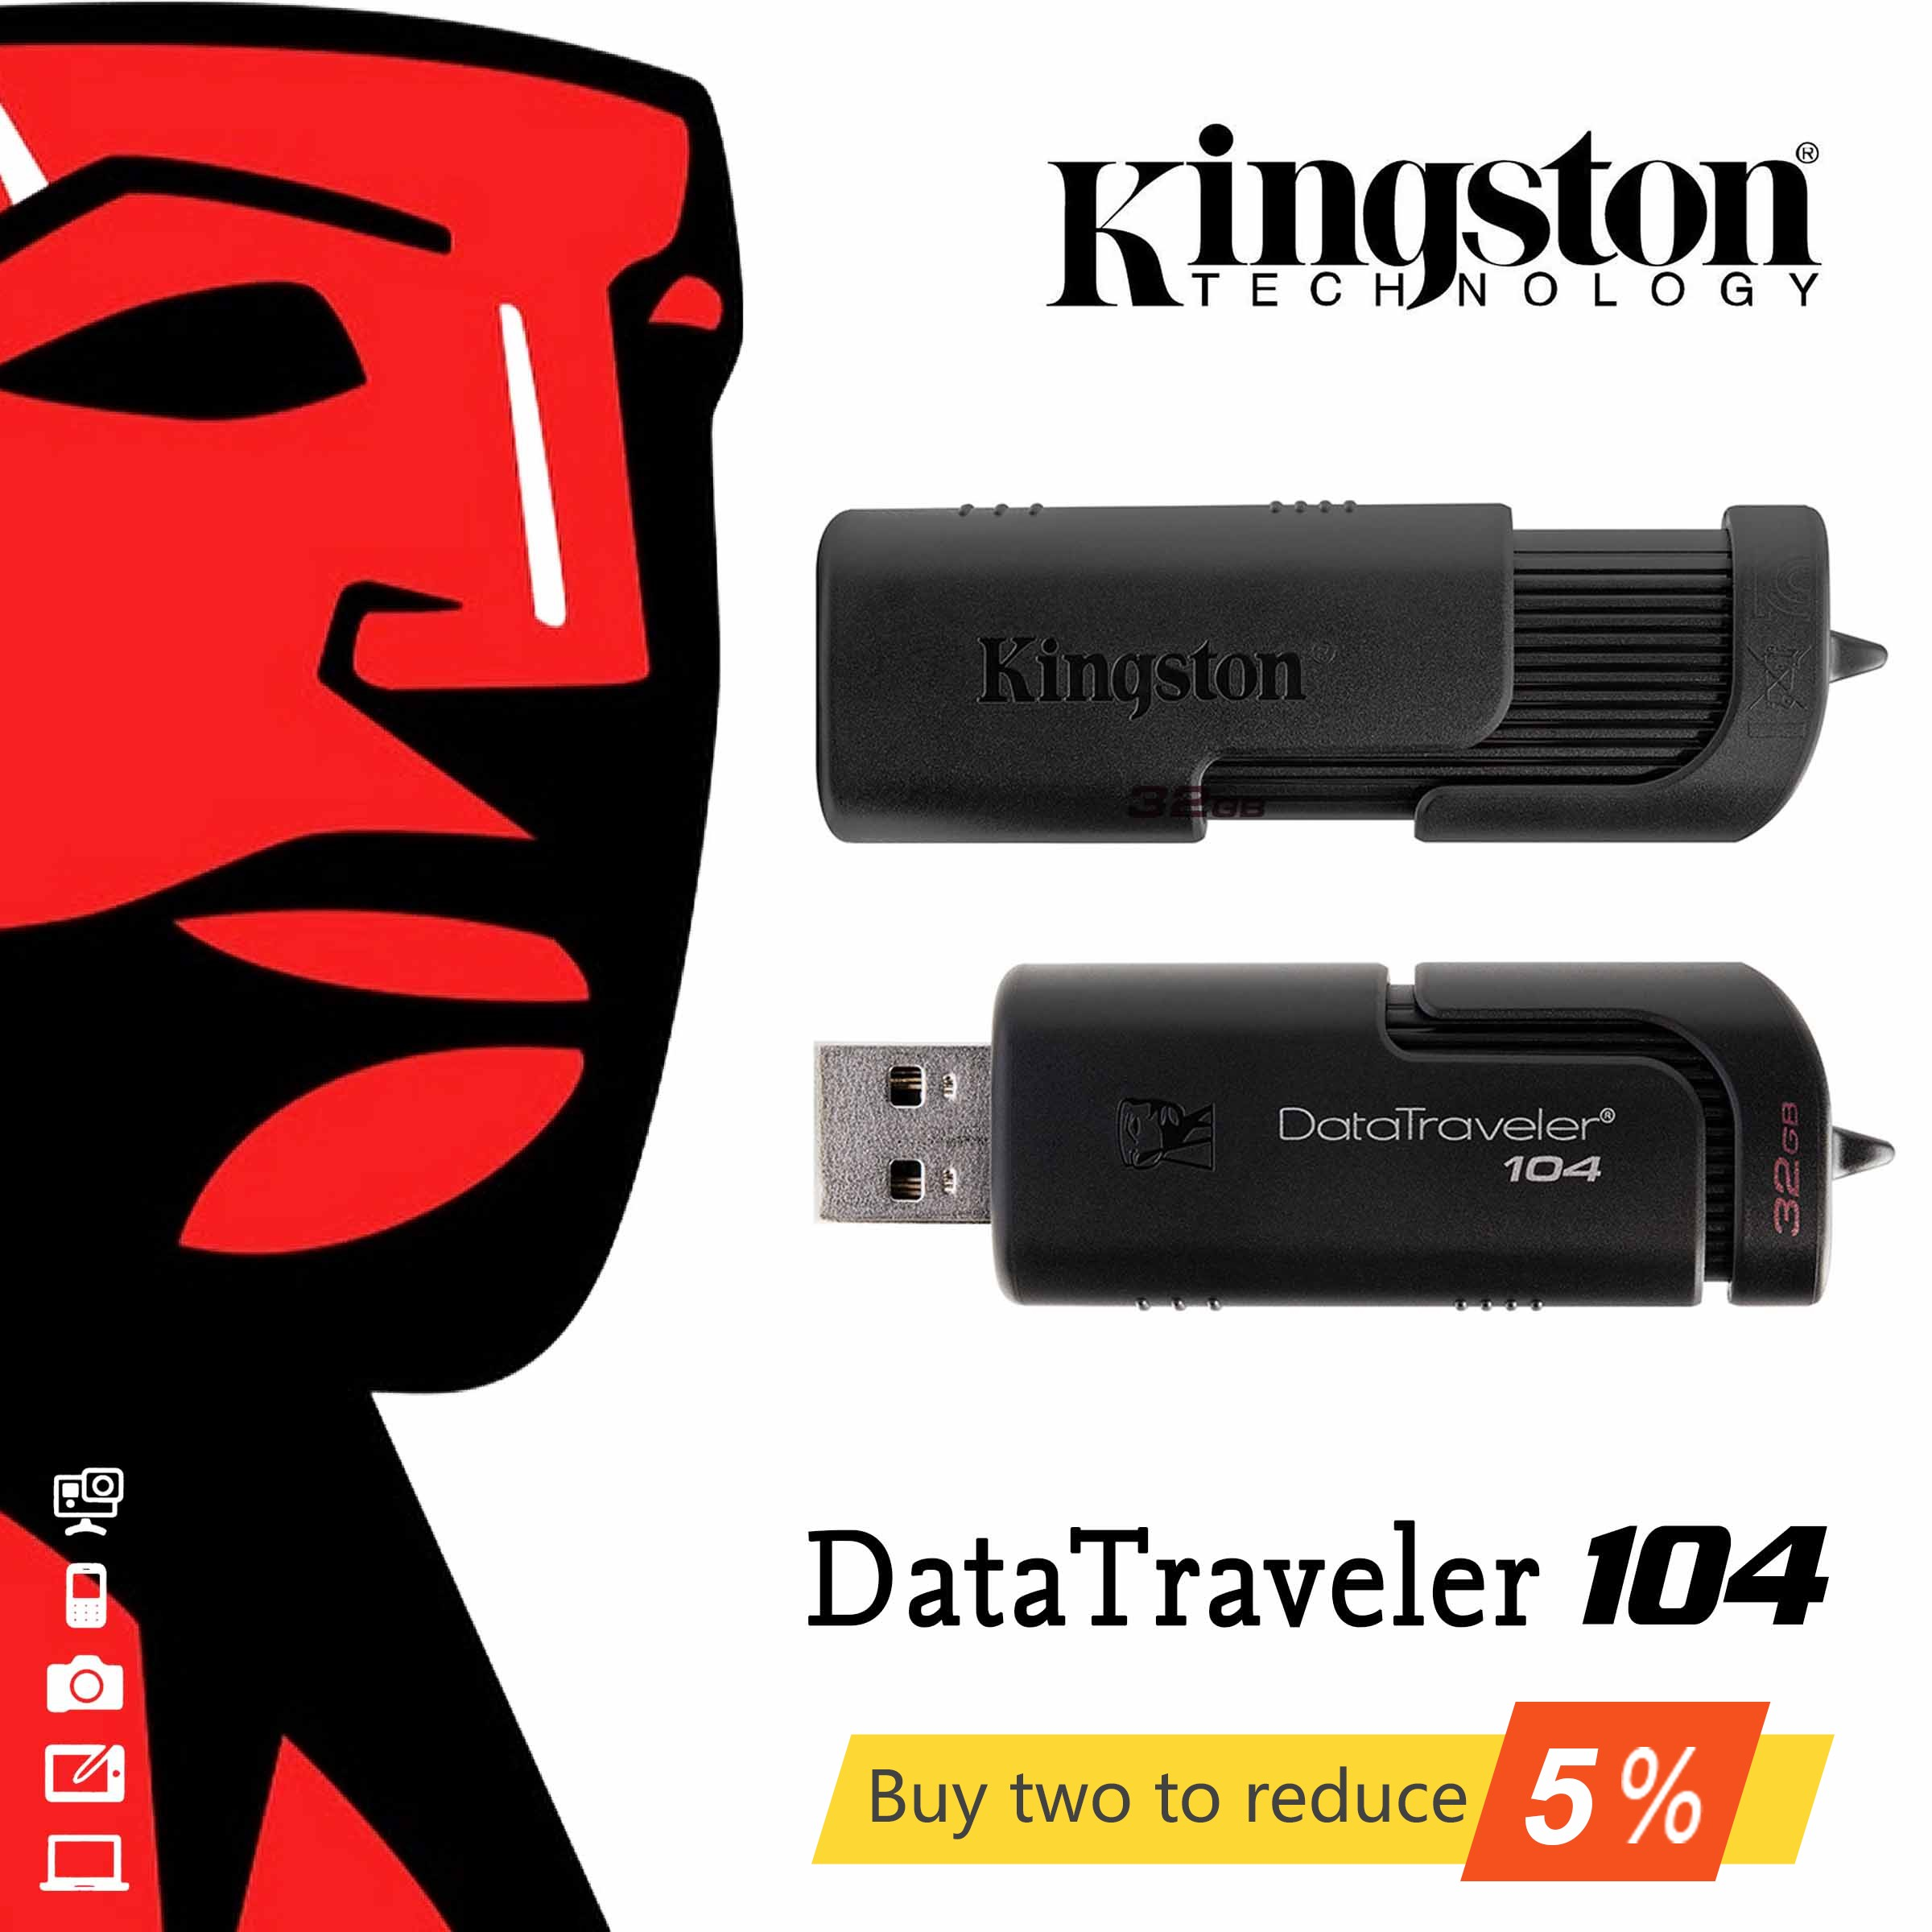 Kingston Original DT104 16G USB Flash Drive Car U Disk 32g Personalized Custom U Disk 64G Computer U Disk 2.0 Bidding U